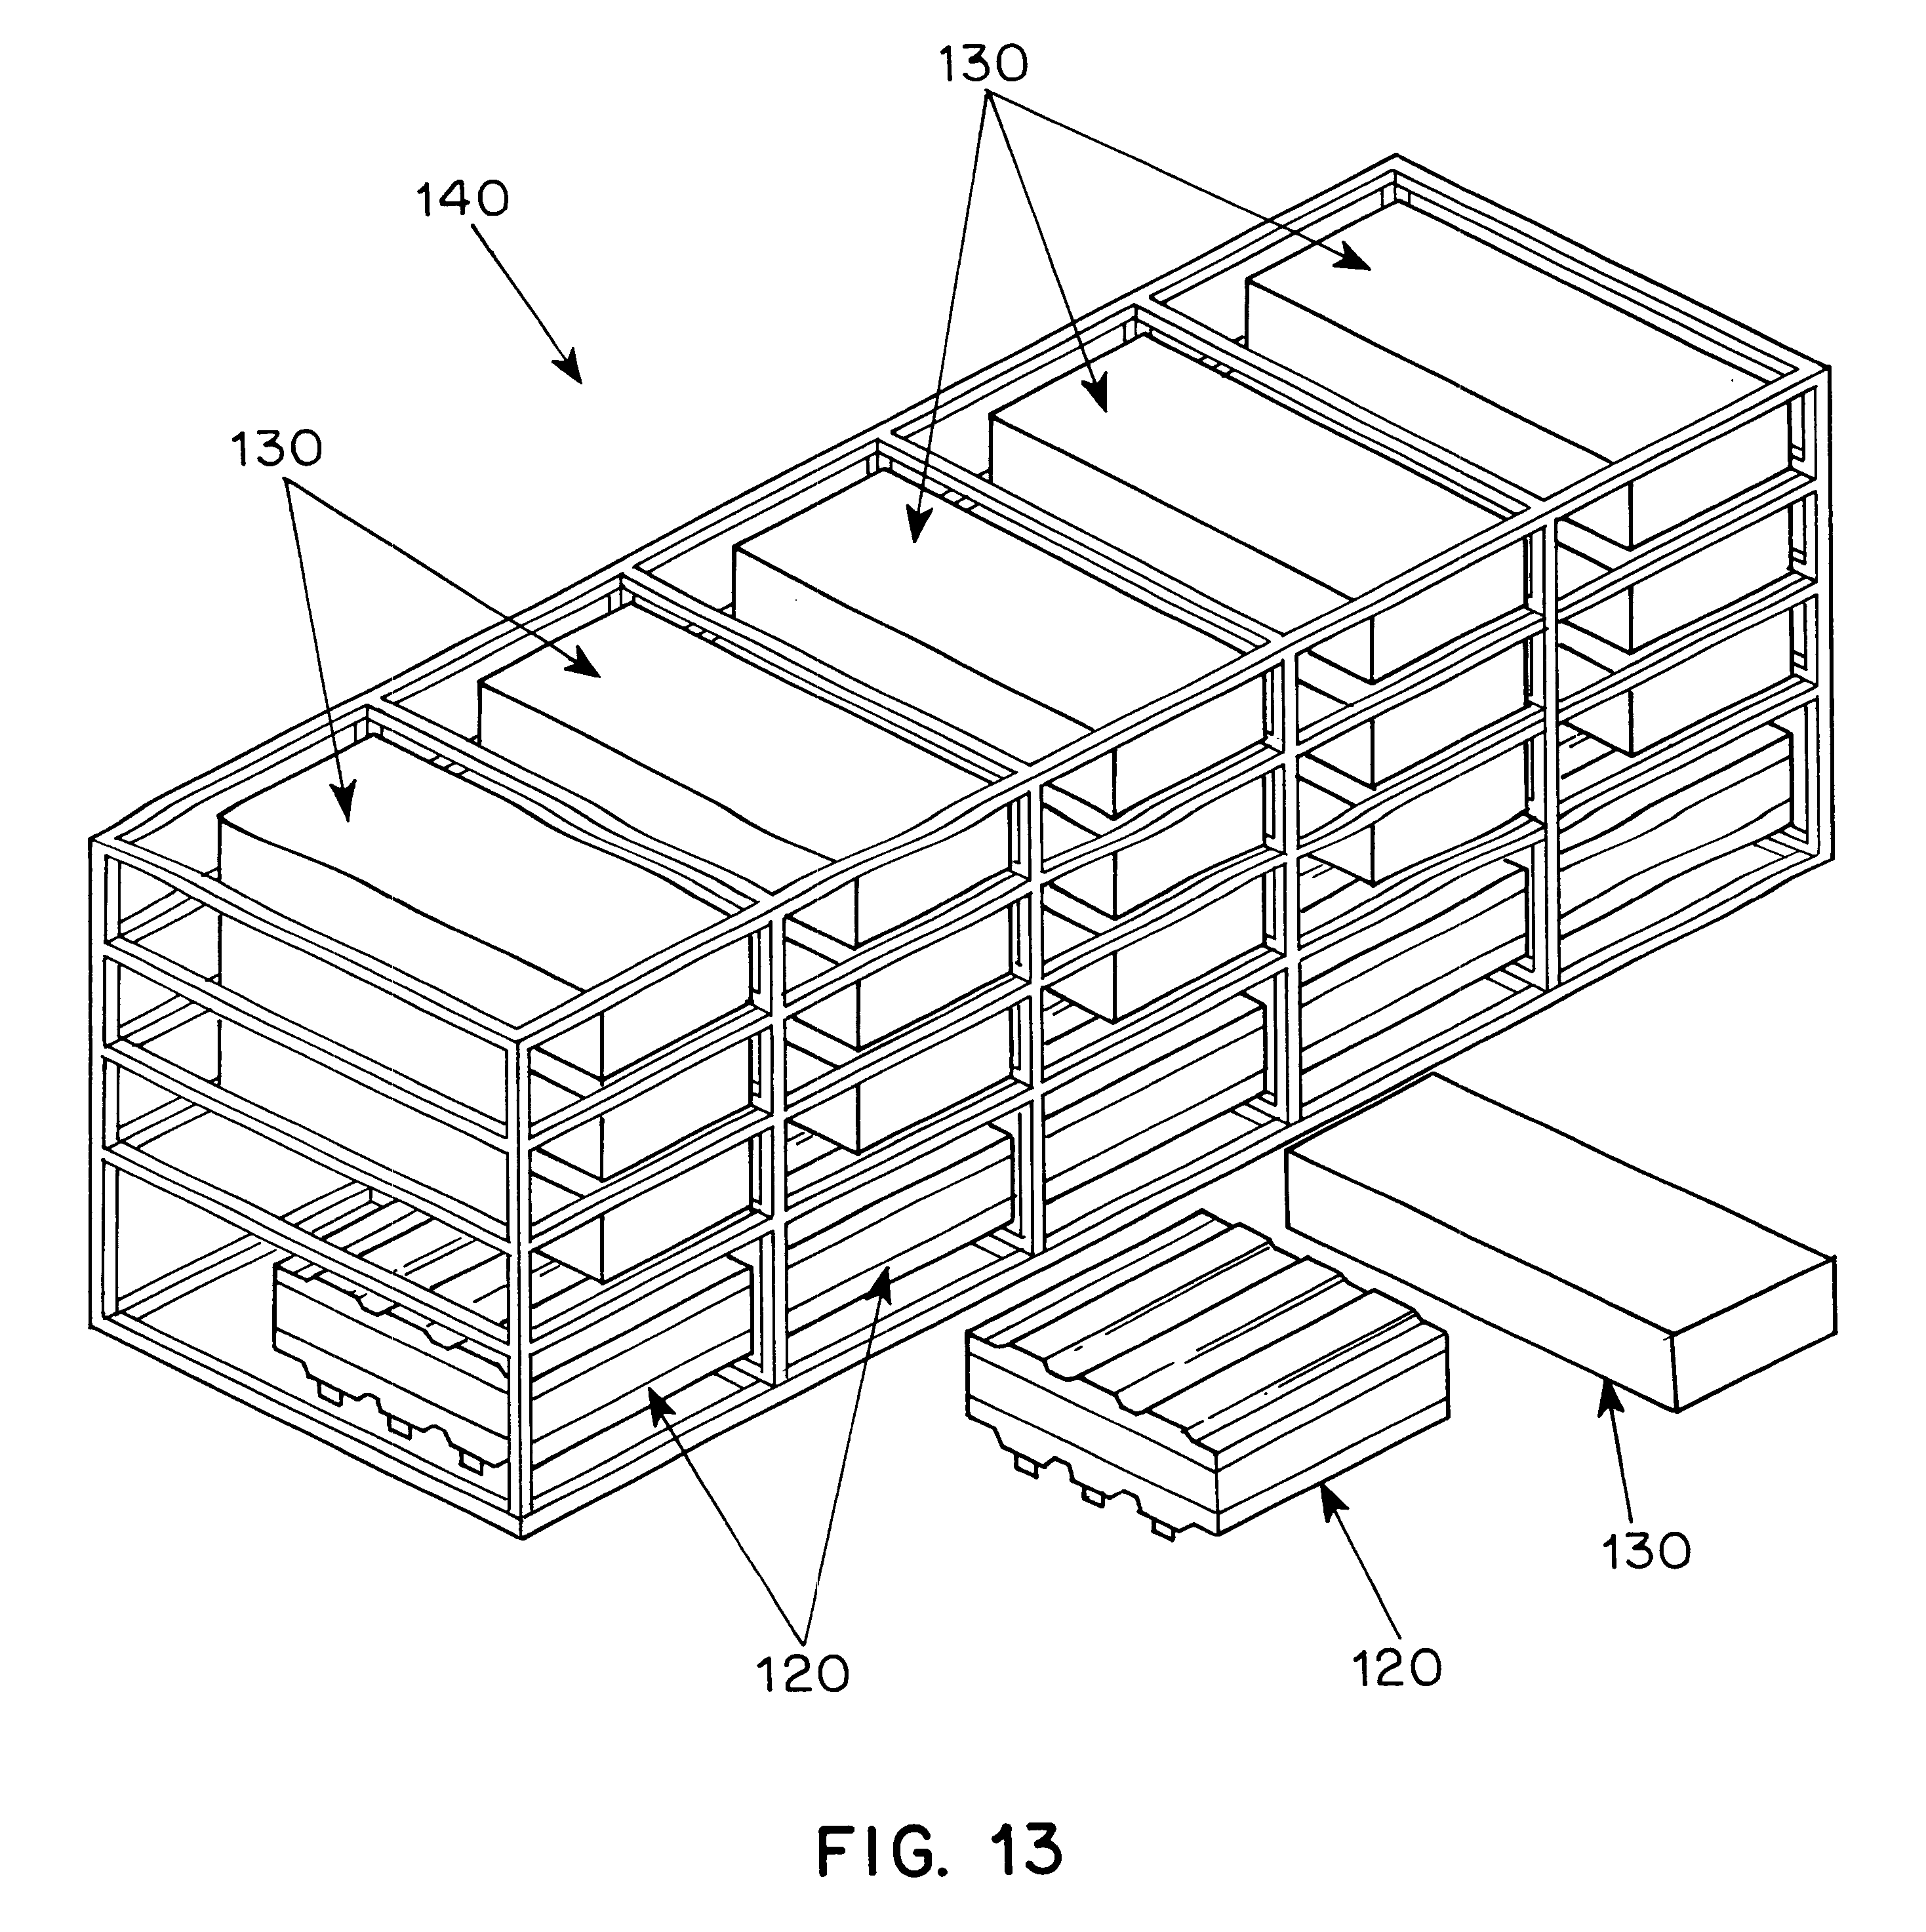 patente us6340851